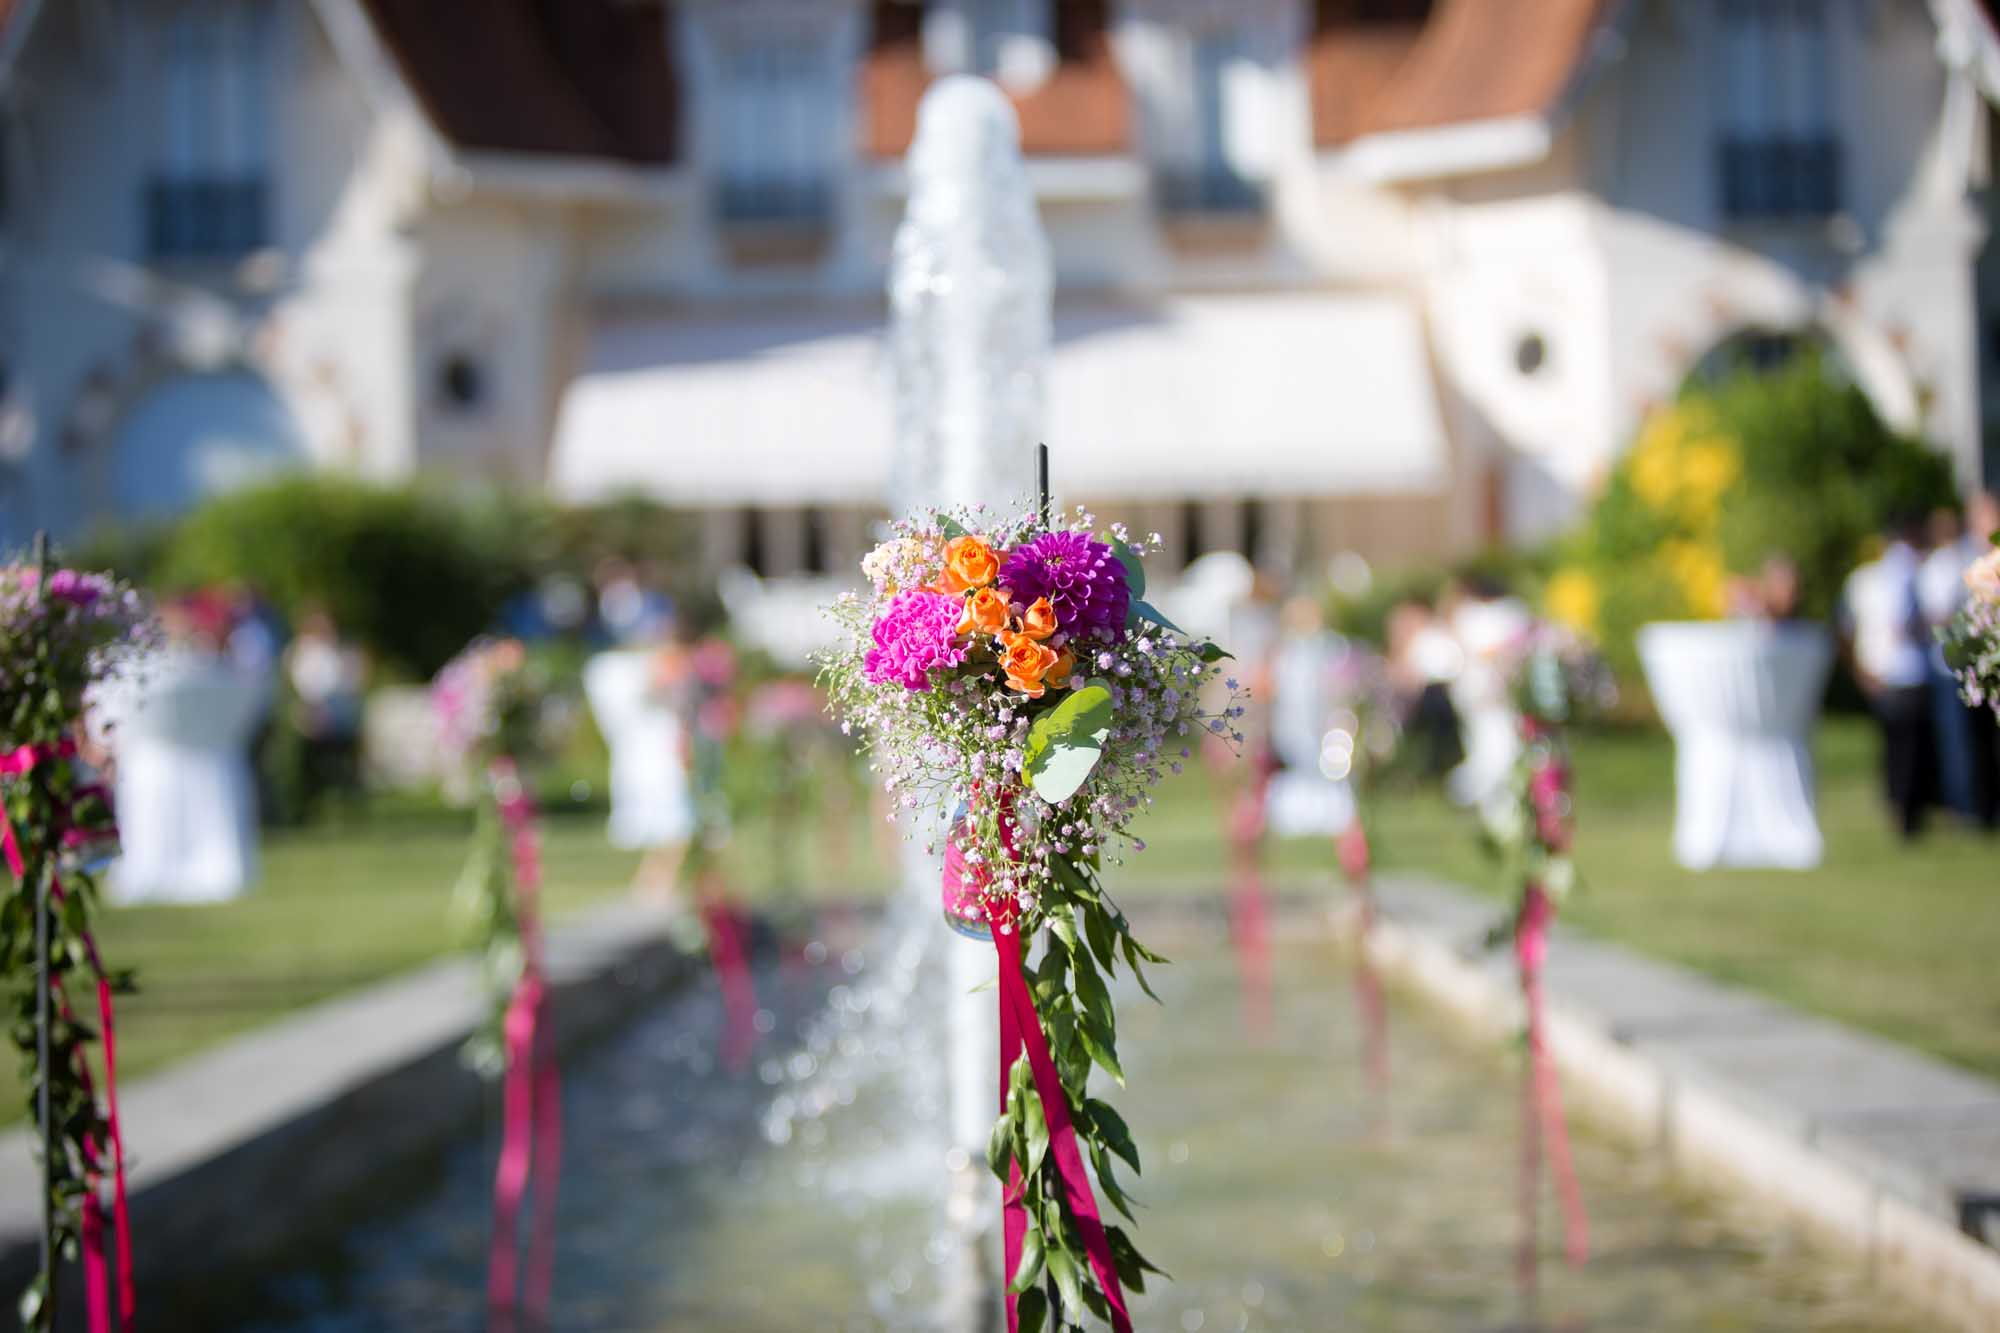 decoration-mariage-decoration-mariageIMG_0869.jpg